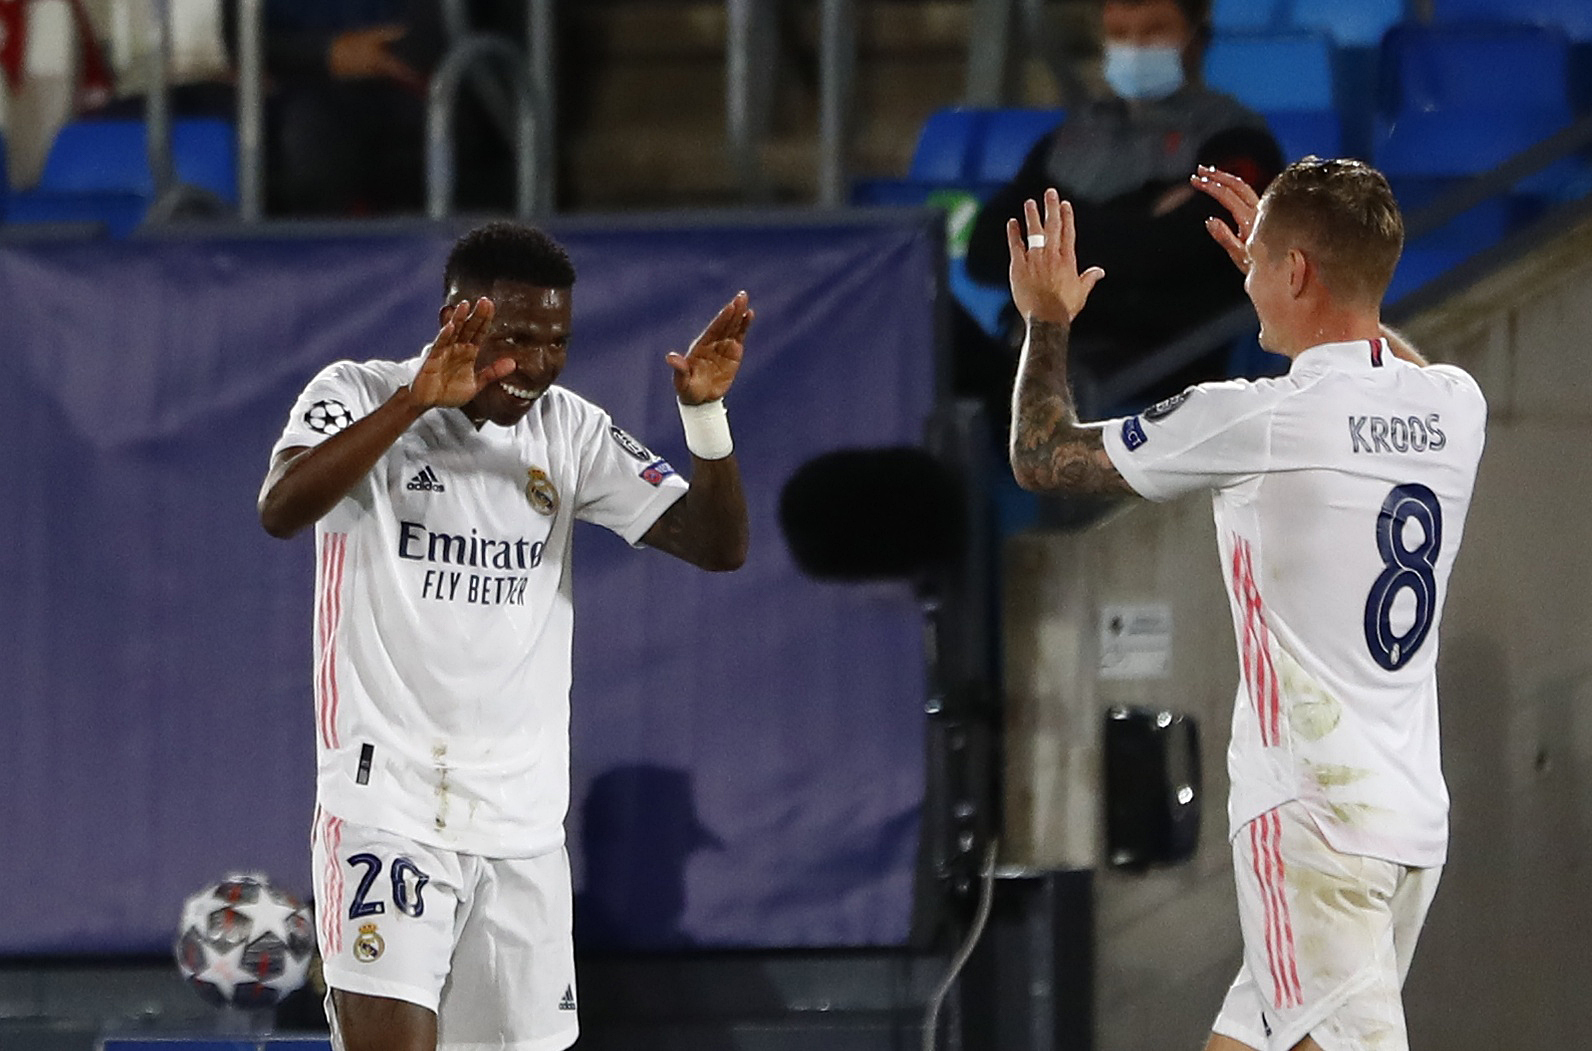 Vinícius celebra el primer gol junto a Toni Kroos